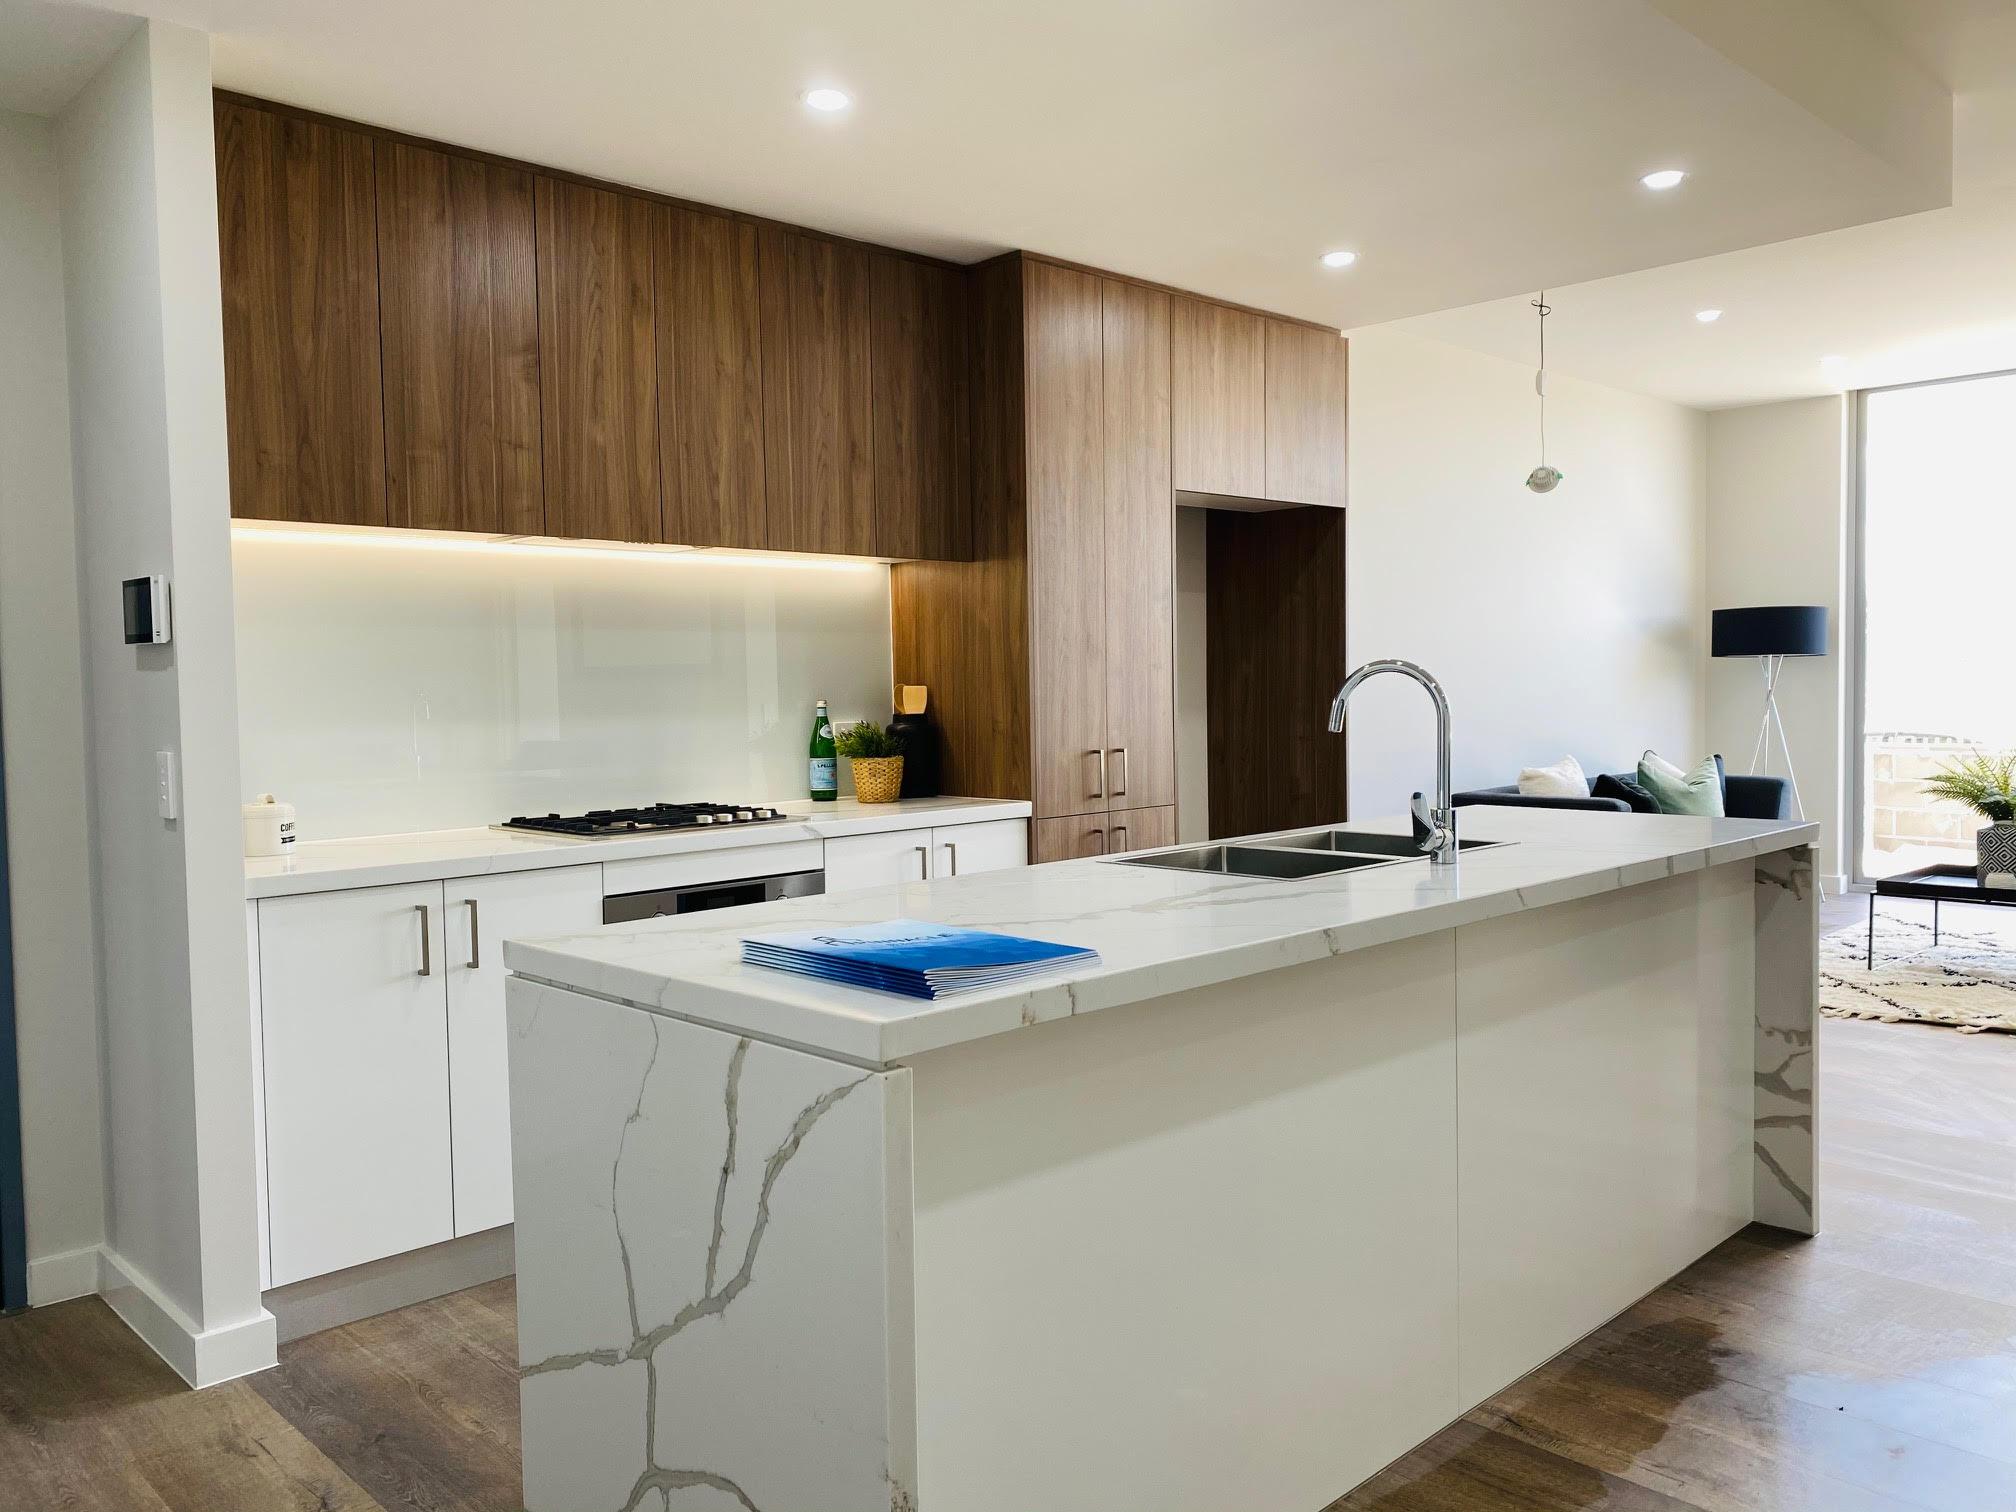 PINNACLE kitchen